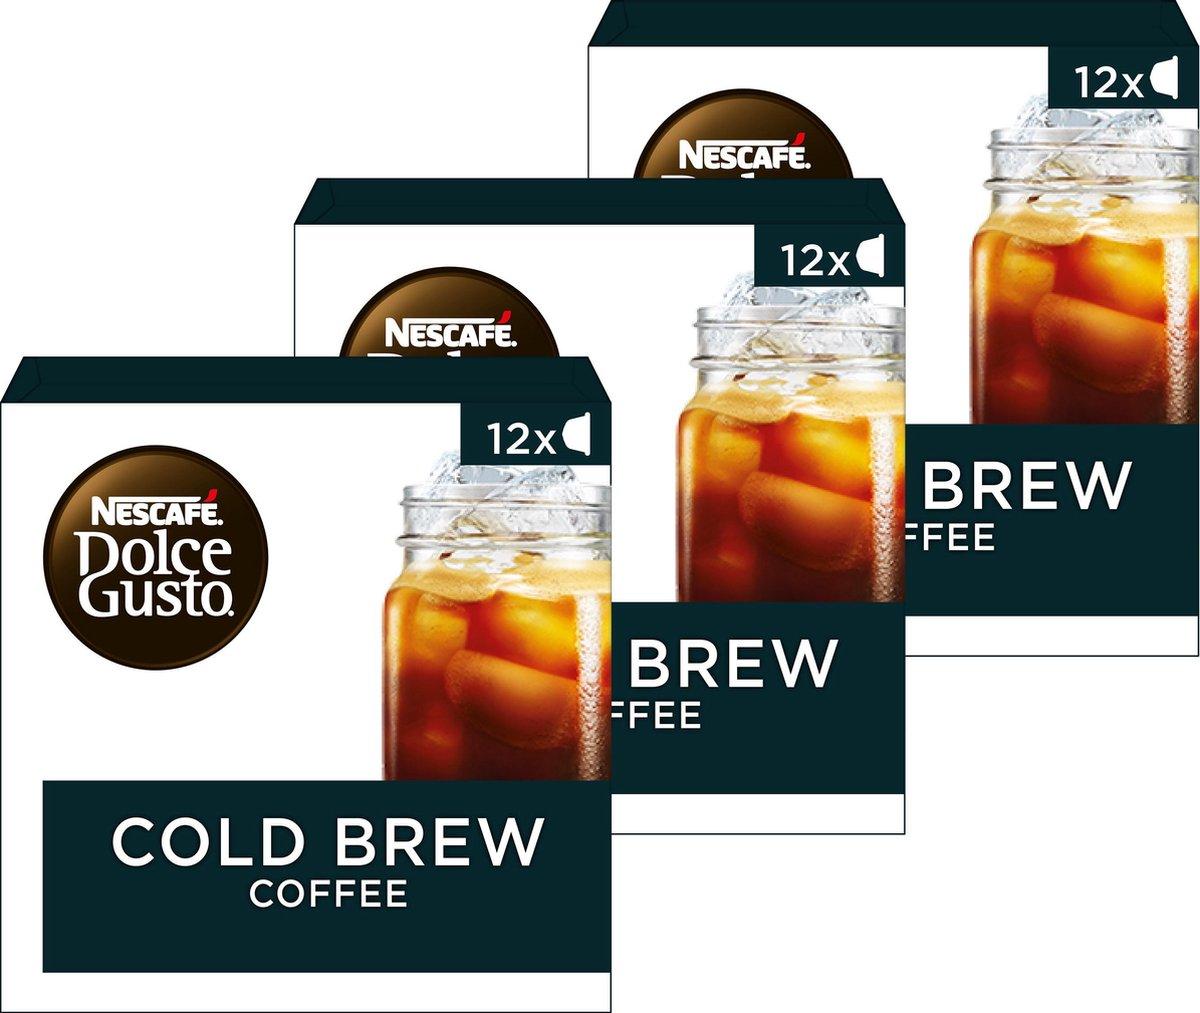 Dolce gusto cold brew 3 dozen